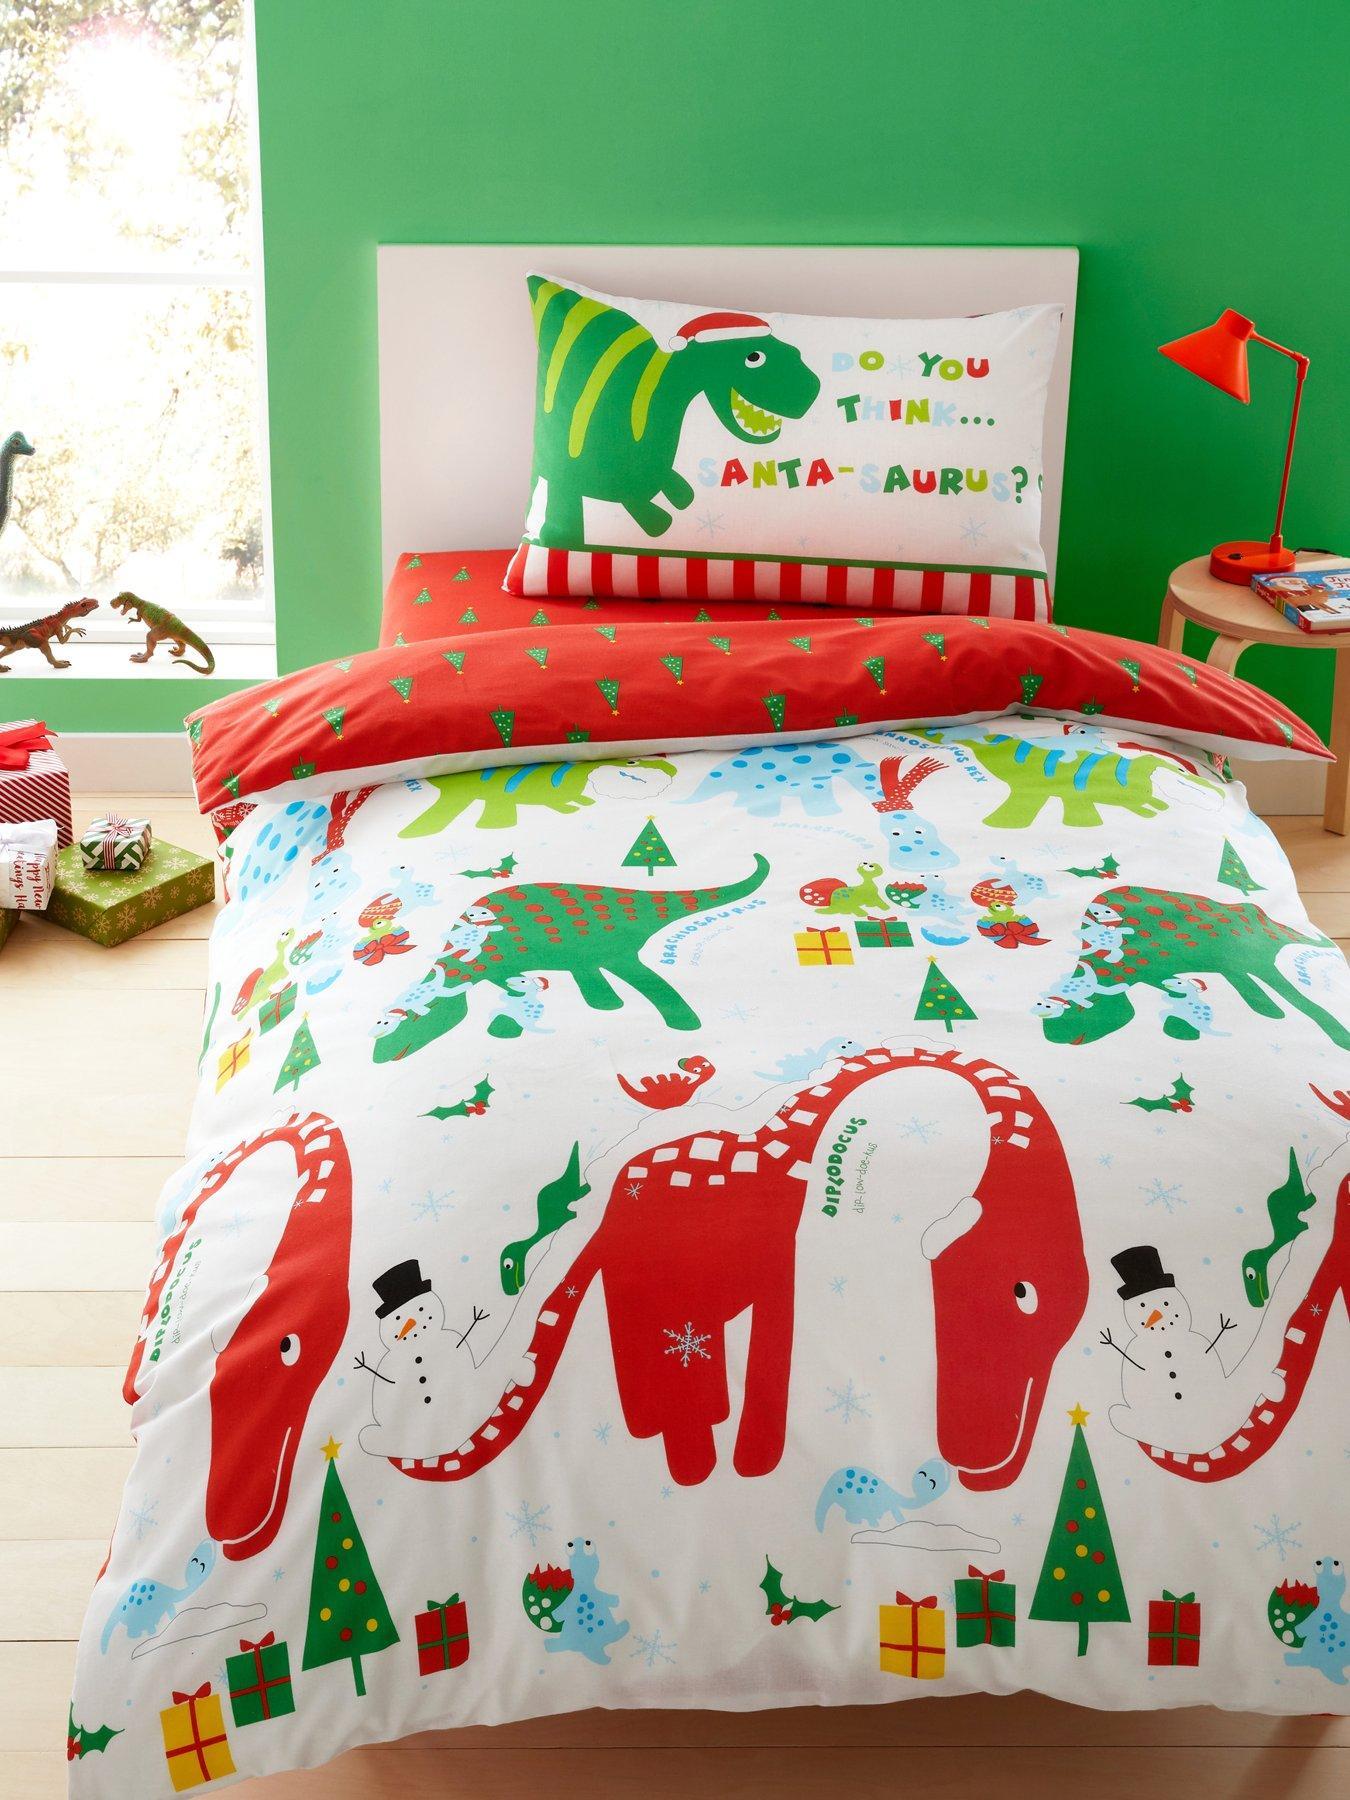 Luxury Winter Wonderland Christmas Foliage Double Duvet Cover Set 100/% Cotton